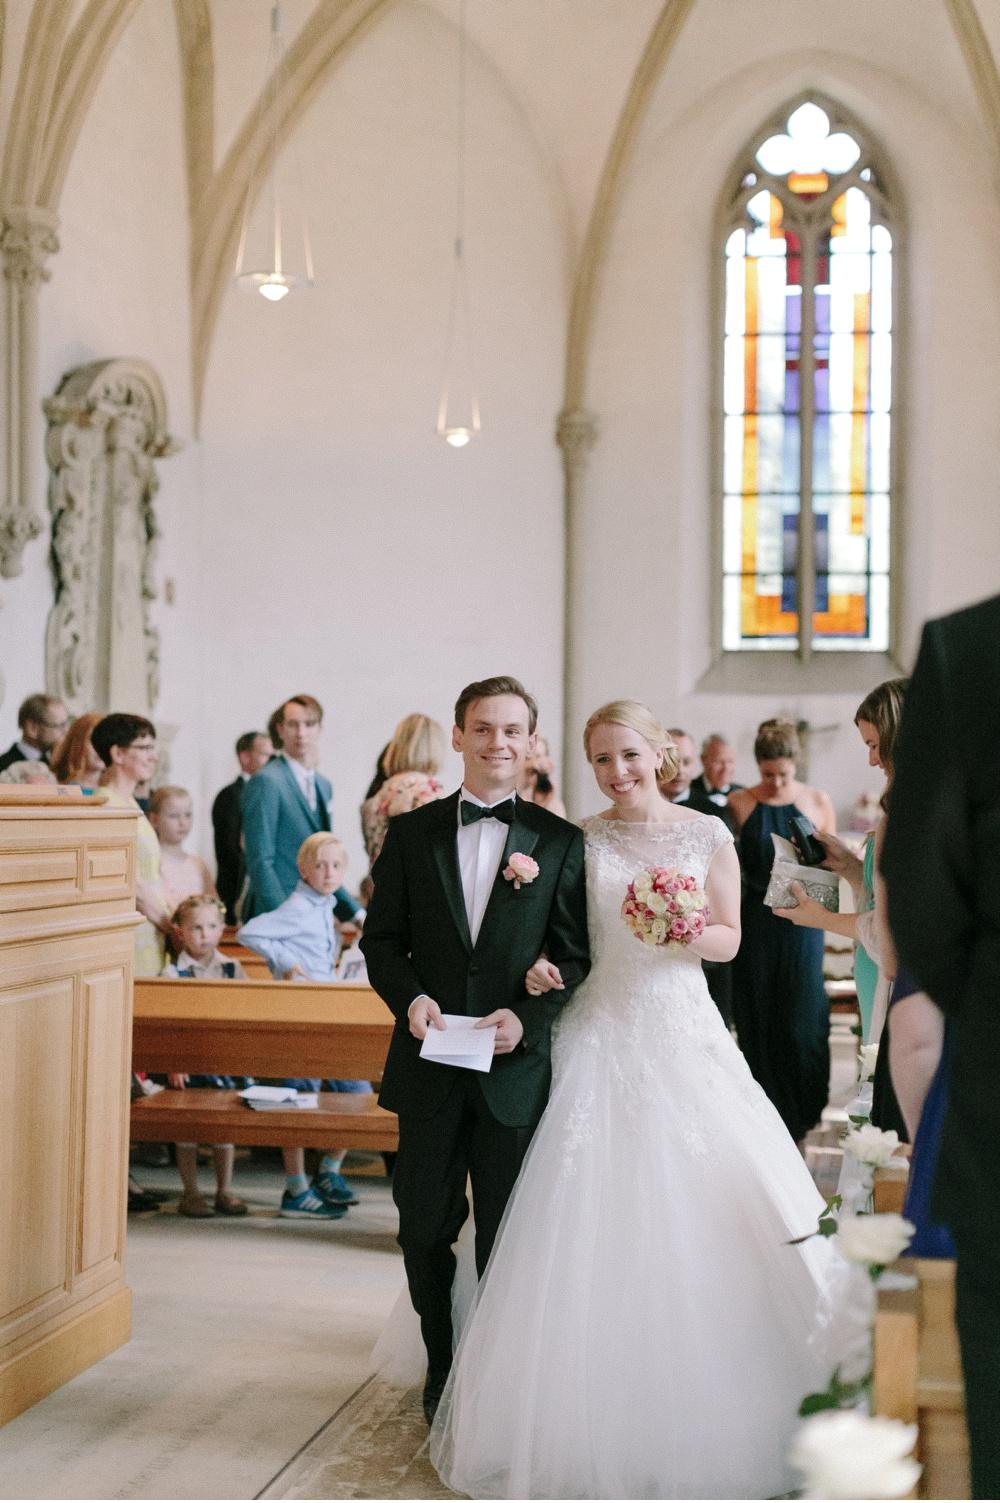 Classy_Norwegian_Wedding_WeddingPhotographer©MadalinaSheldon_0006.jpg